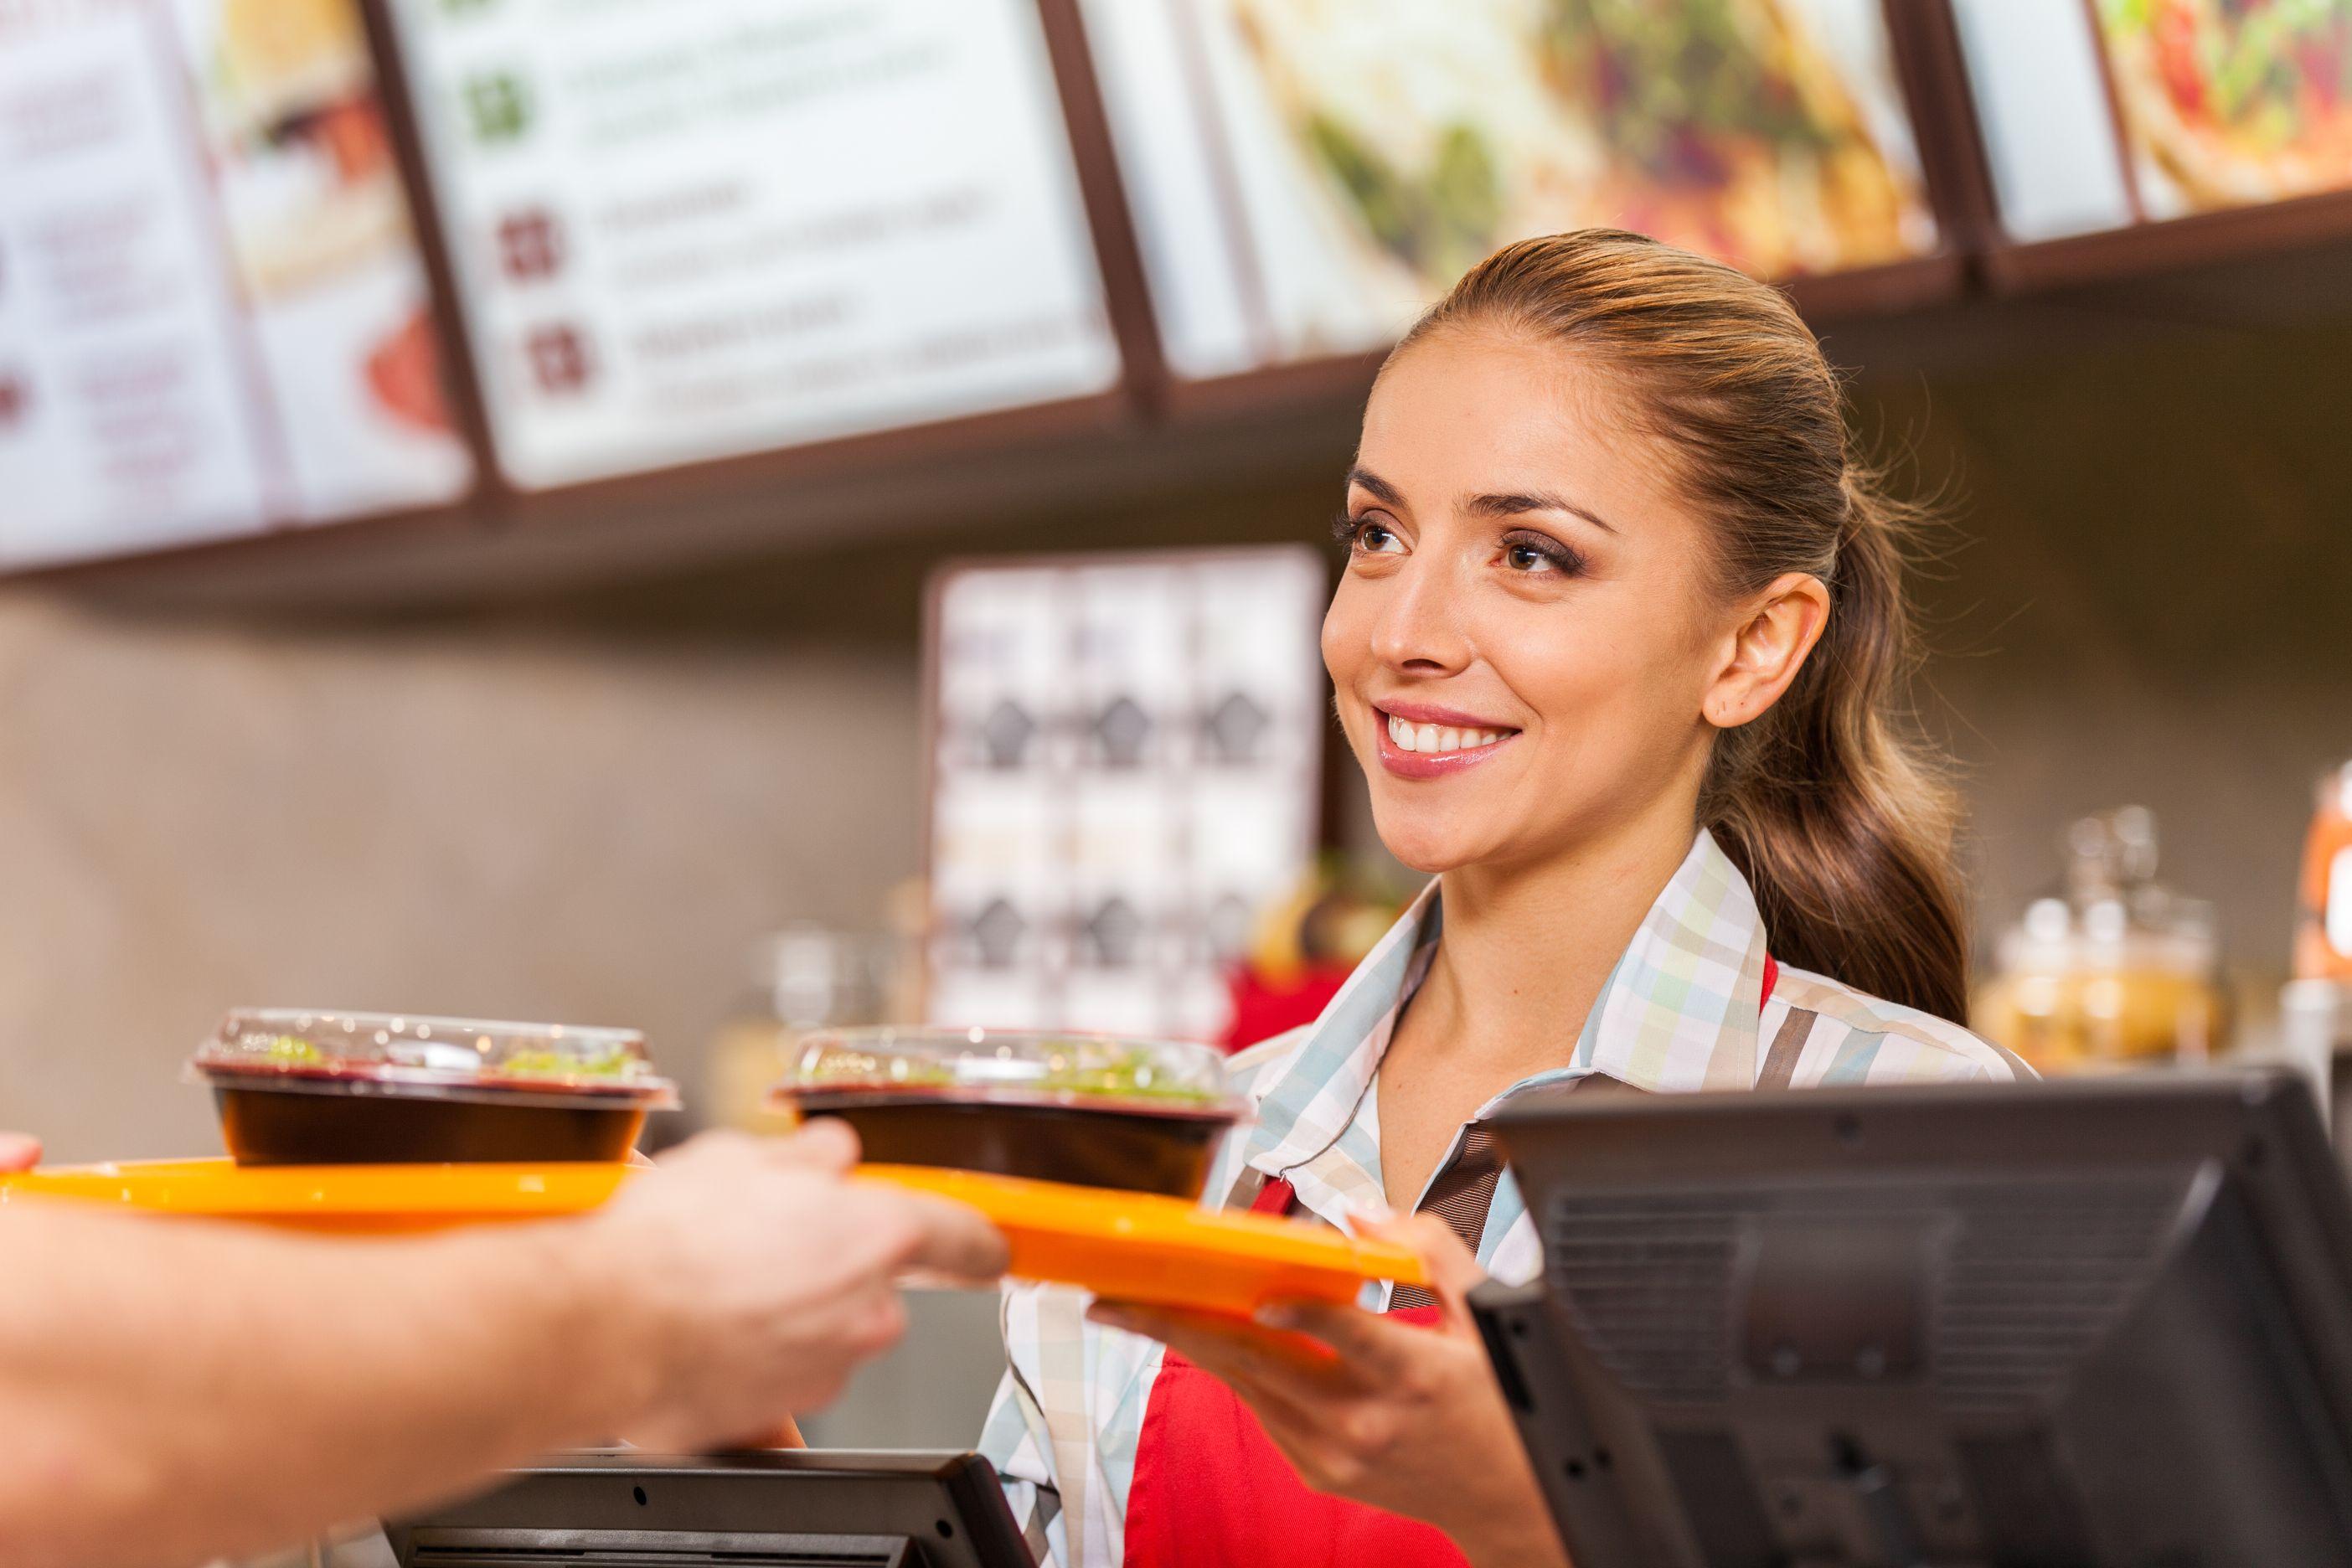 Restaurant - Fast Food